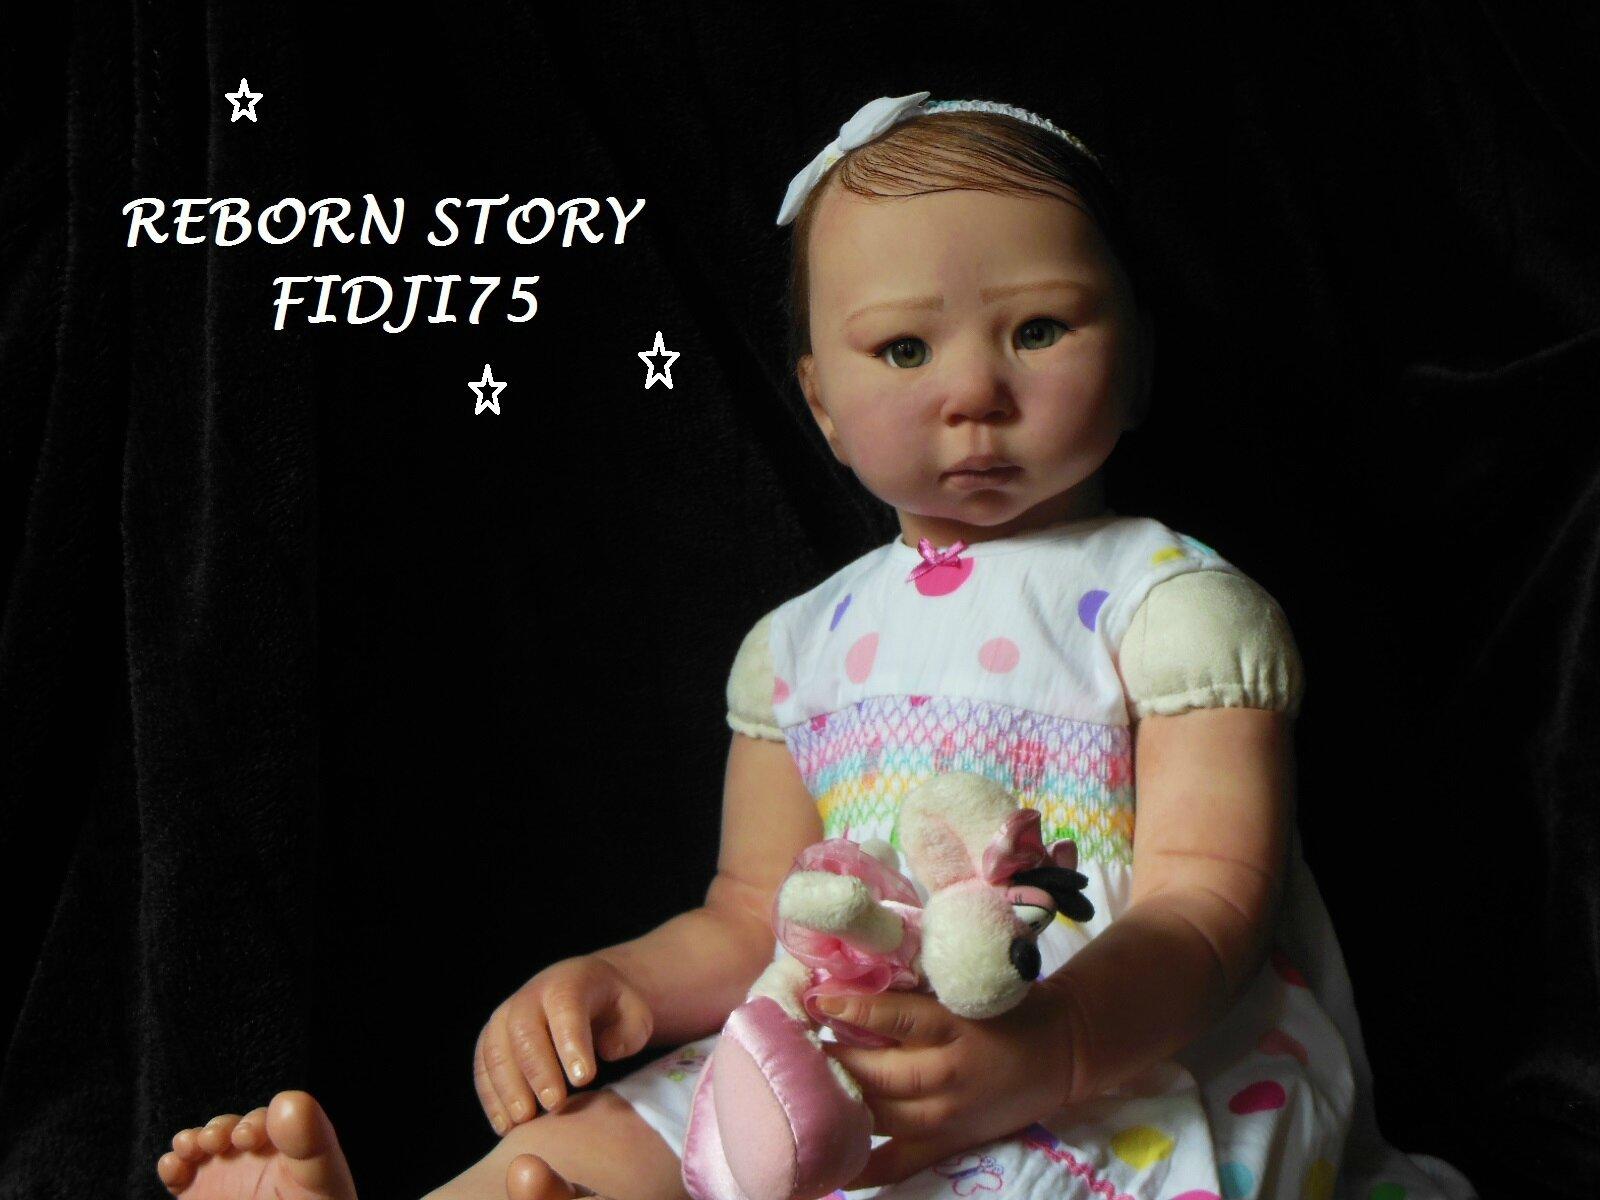 DSCN4326REBORN STORY